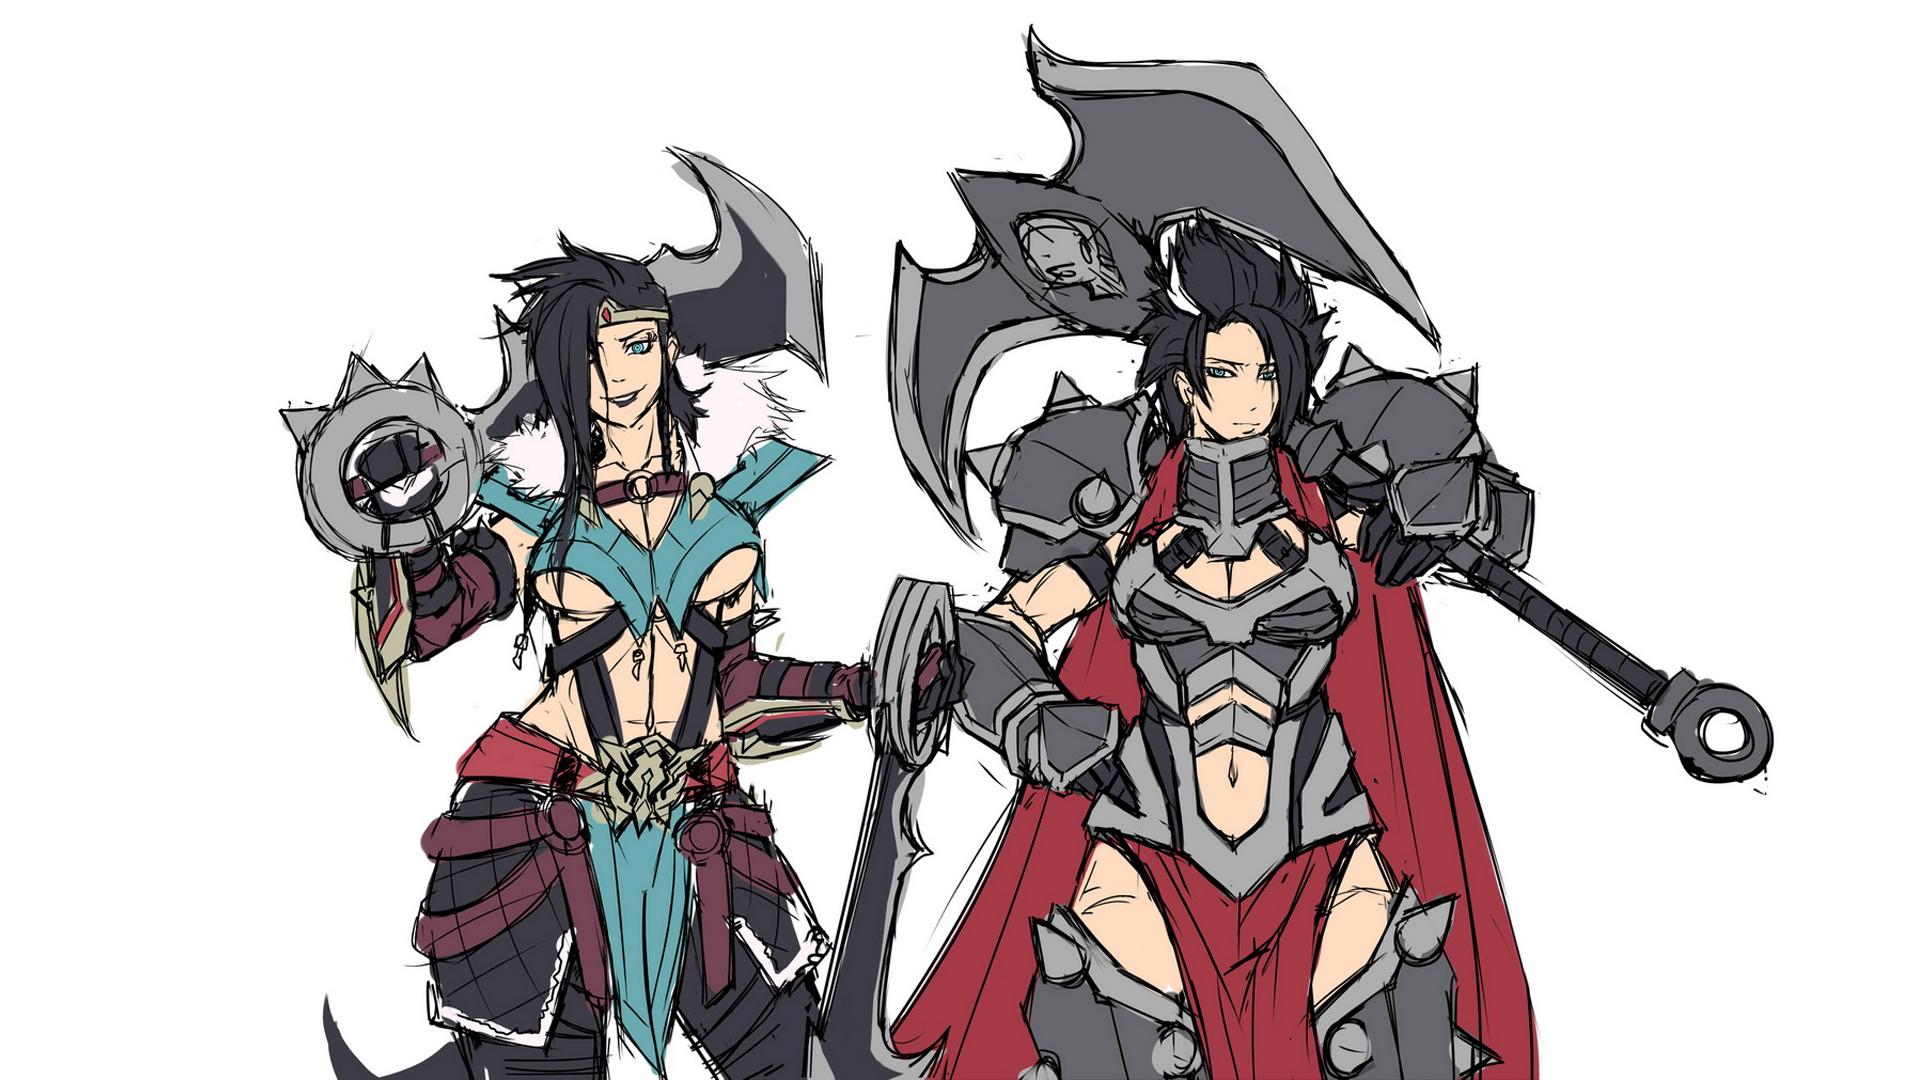 draven and darius girl version league of legends hd wallpaper lol    League Of Legends Wallpaper Darius Draven